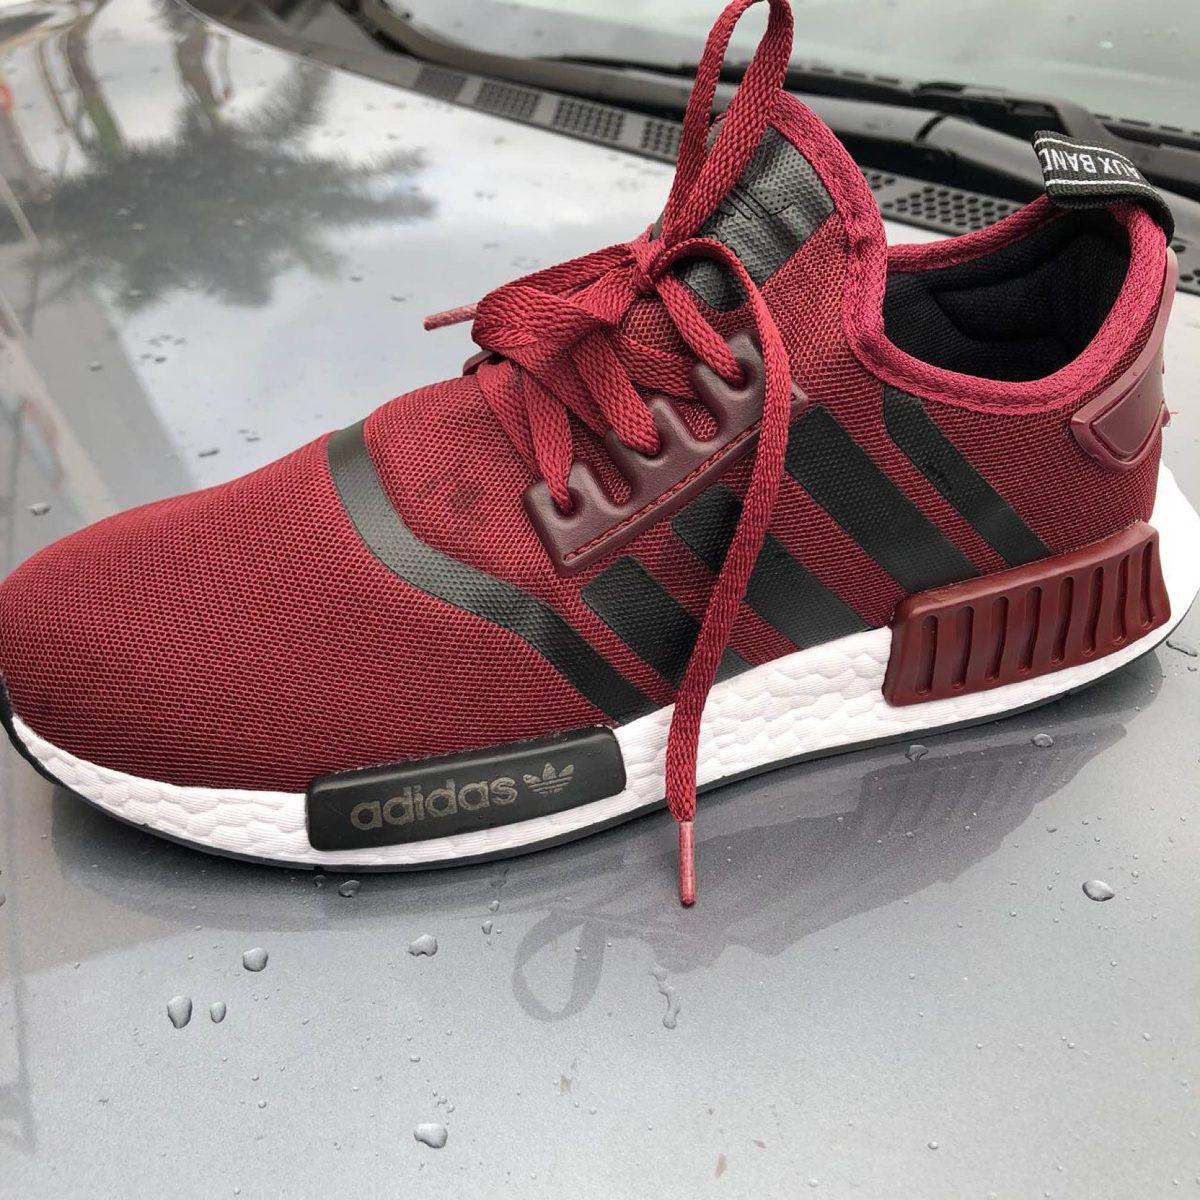 Adidas R1Ventes Nmd Citroen Runner Flash LSqUVpzMG